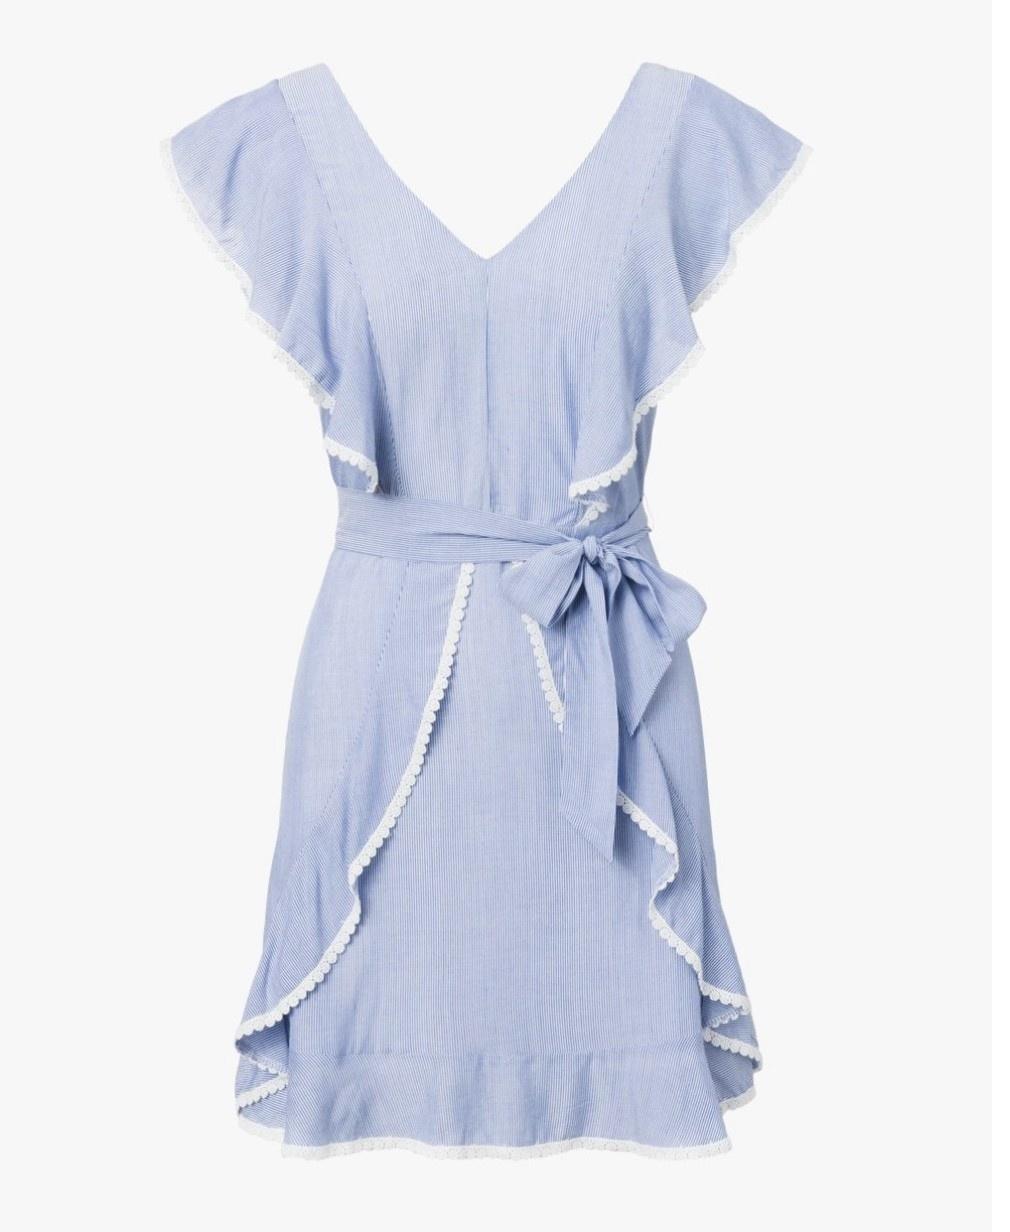 Cupcakes & Cashmere 'Mitzi' Yarn Ruffle Dress in blue stripe